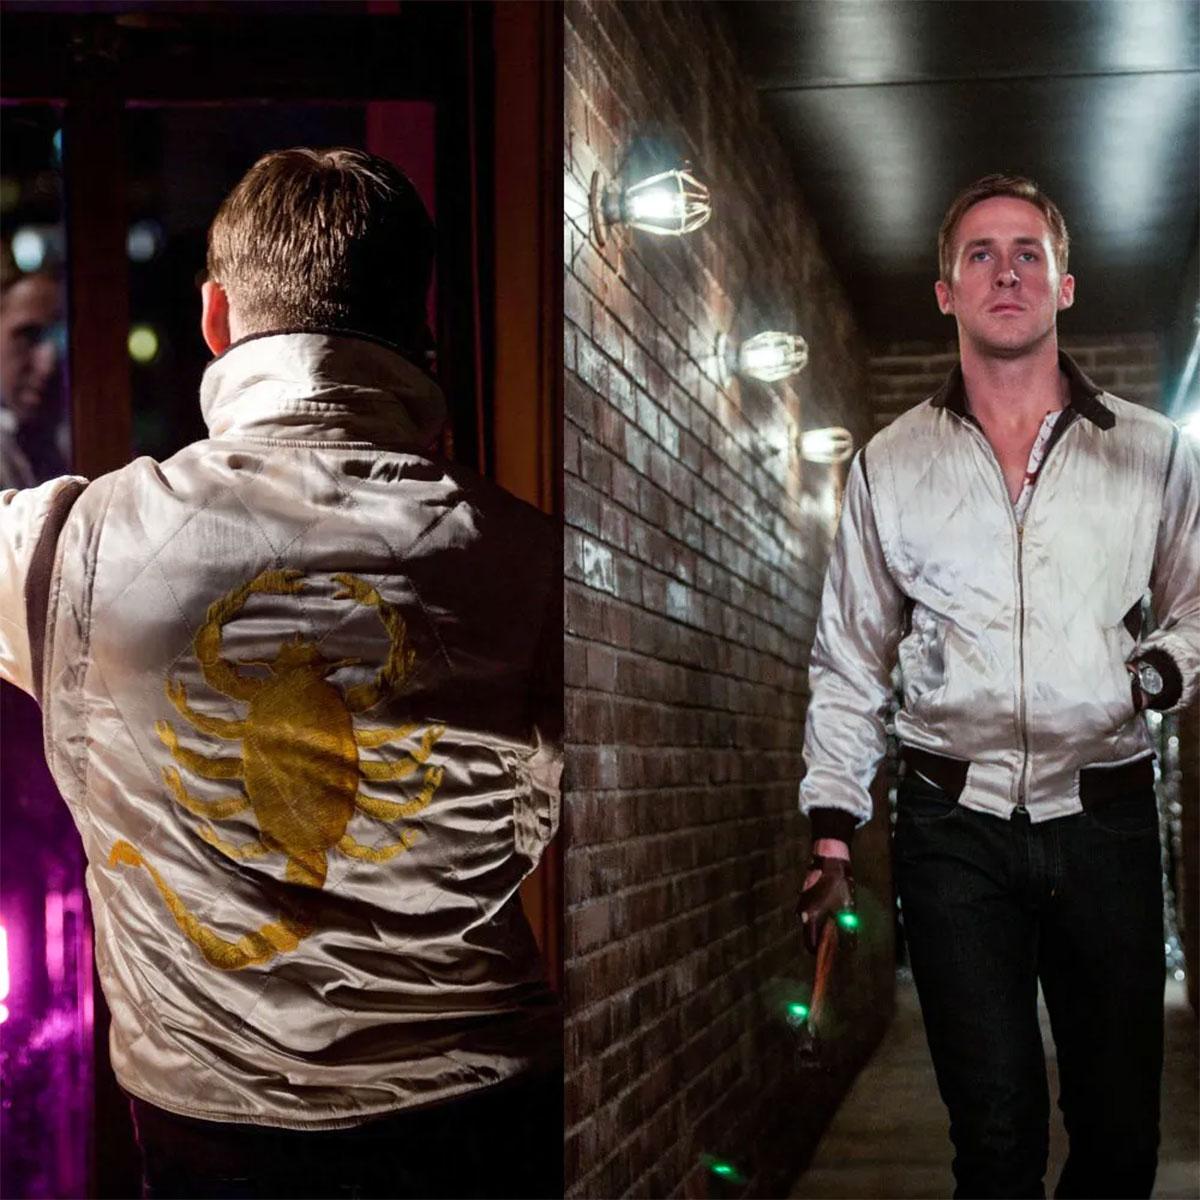 La mitica giacca del pilota indossata da Ryan Gosling